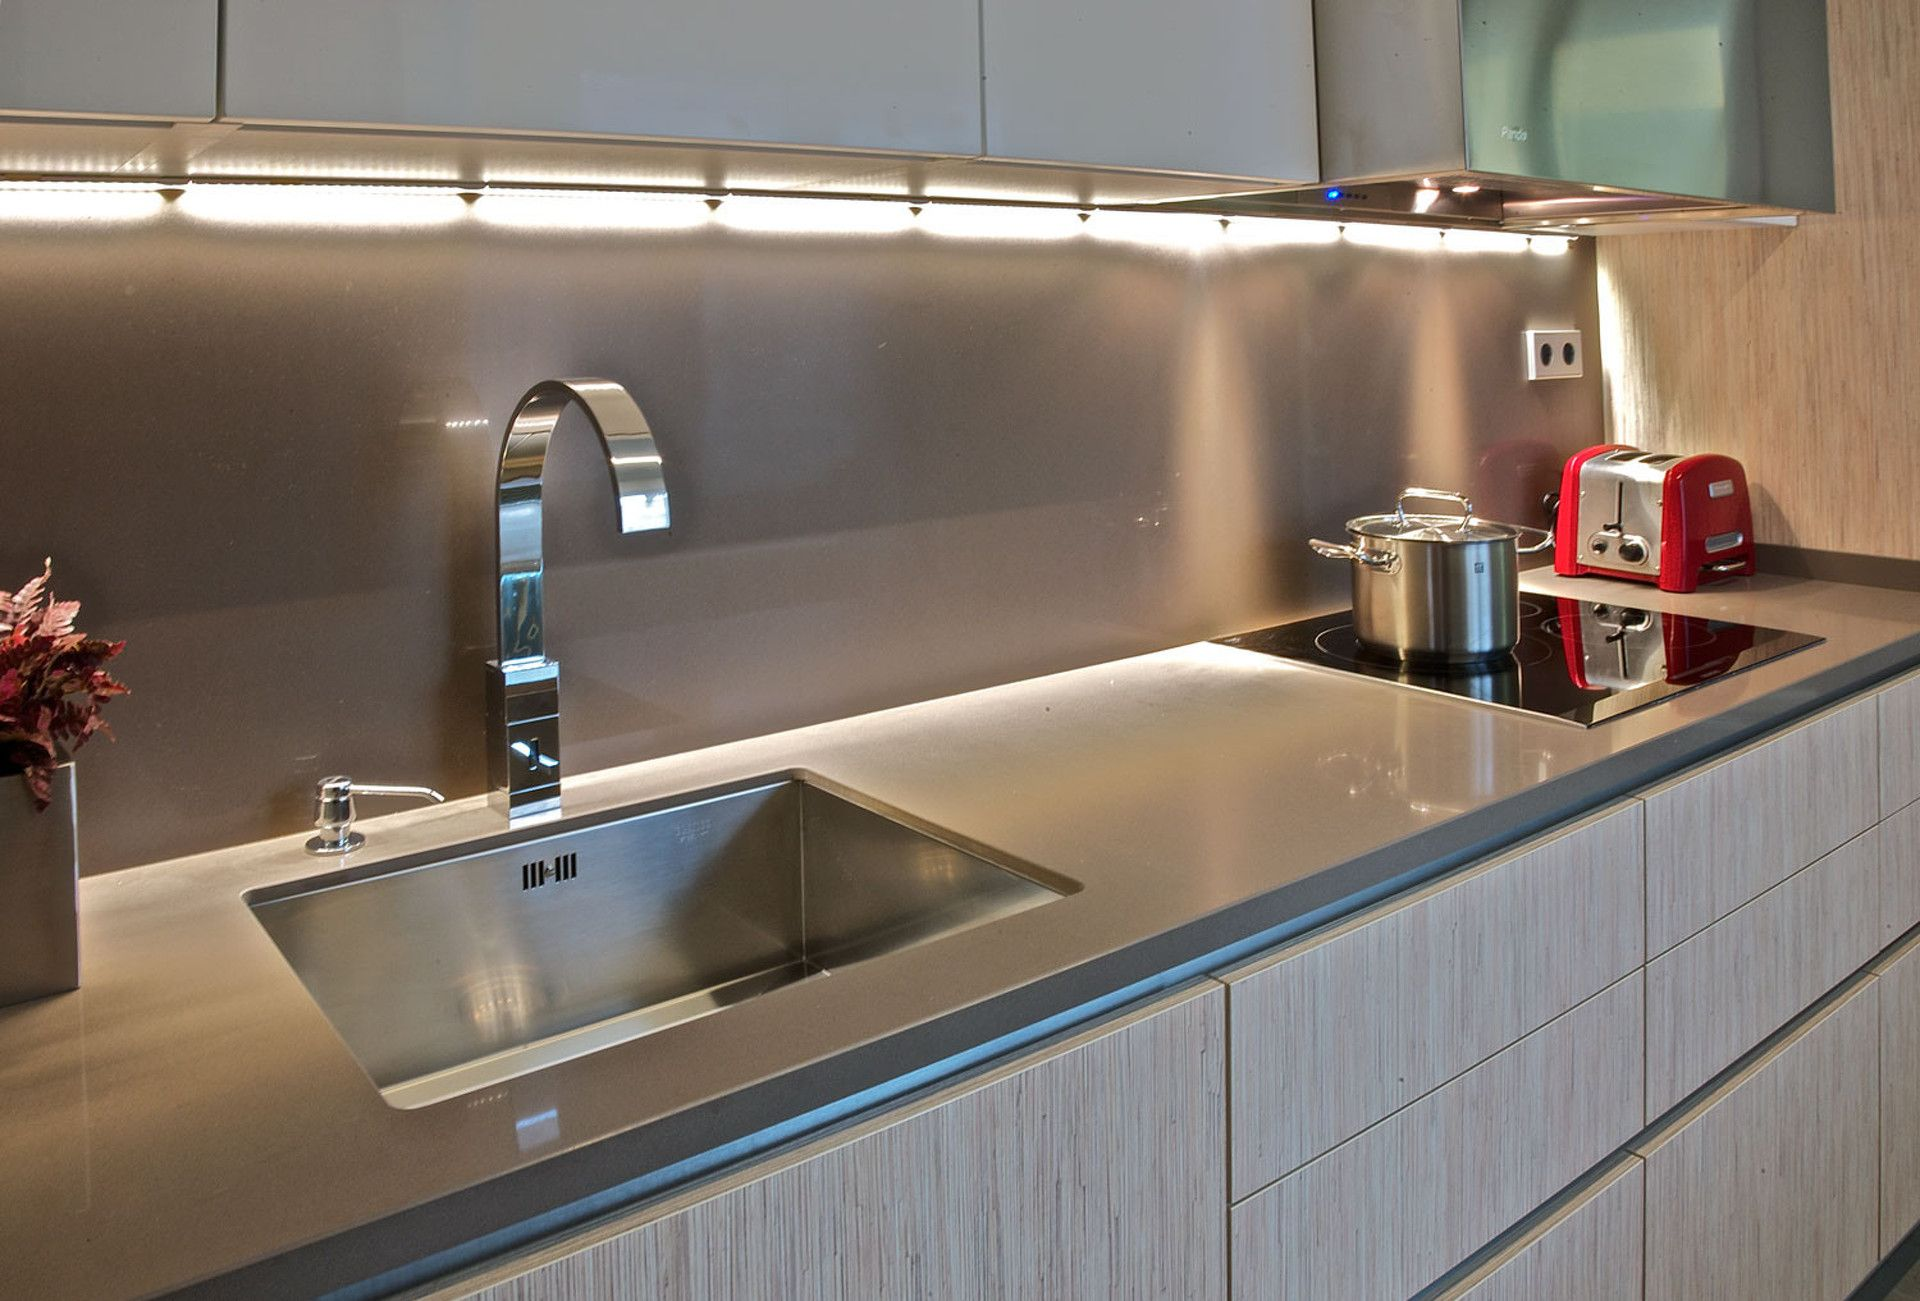 Cocina loft en Bilbao - Urbana 15 | Mi cocina | Pinterest | Loft ...